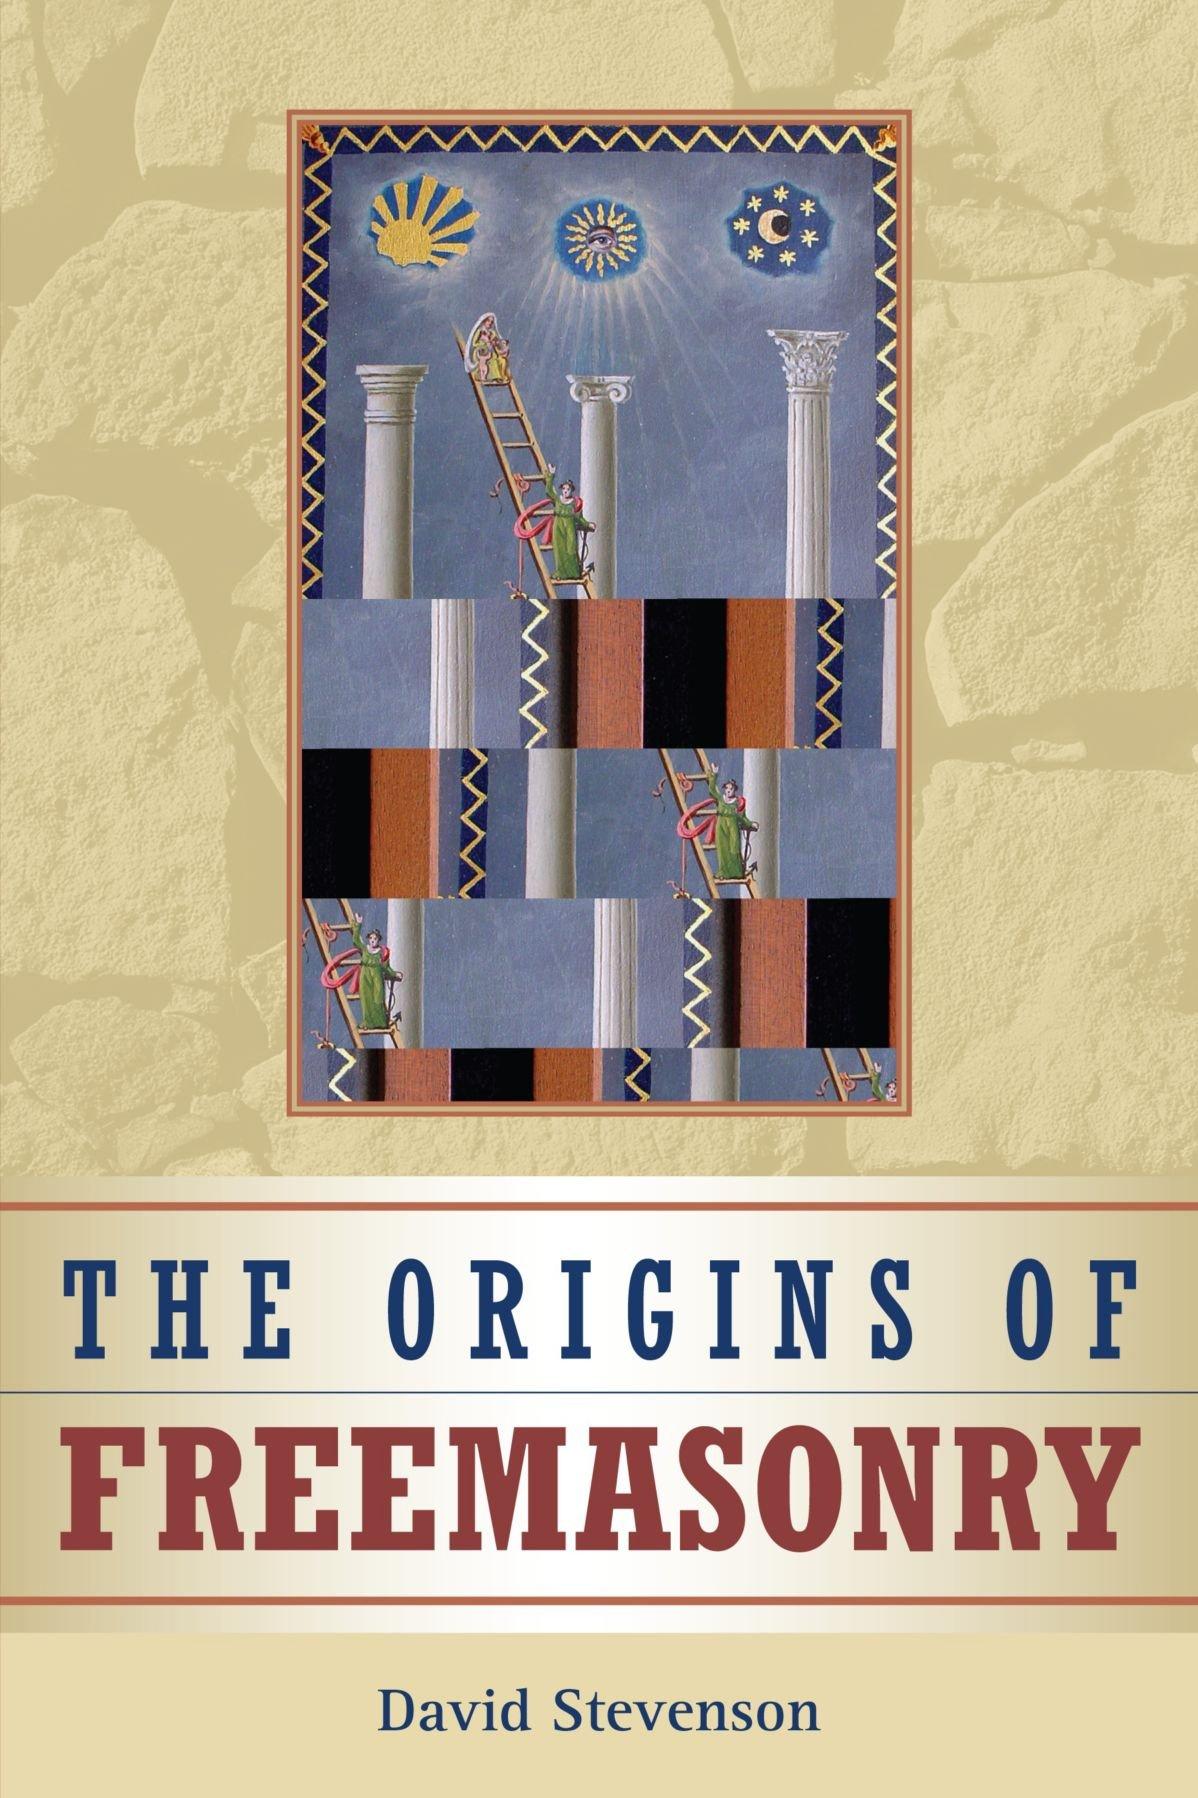 The Origins of Freemasonry: Scotland's Century, 1590 to 1710